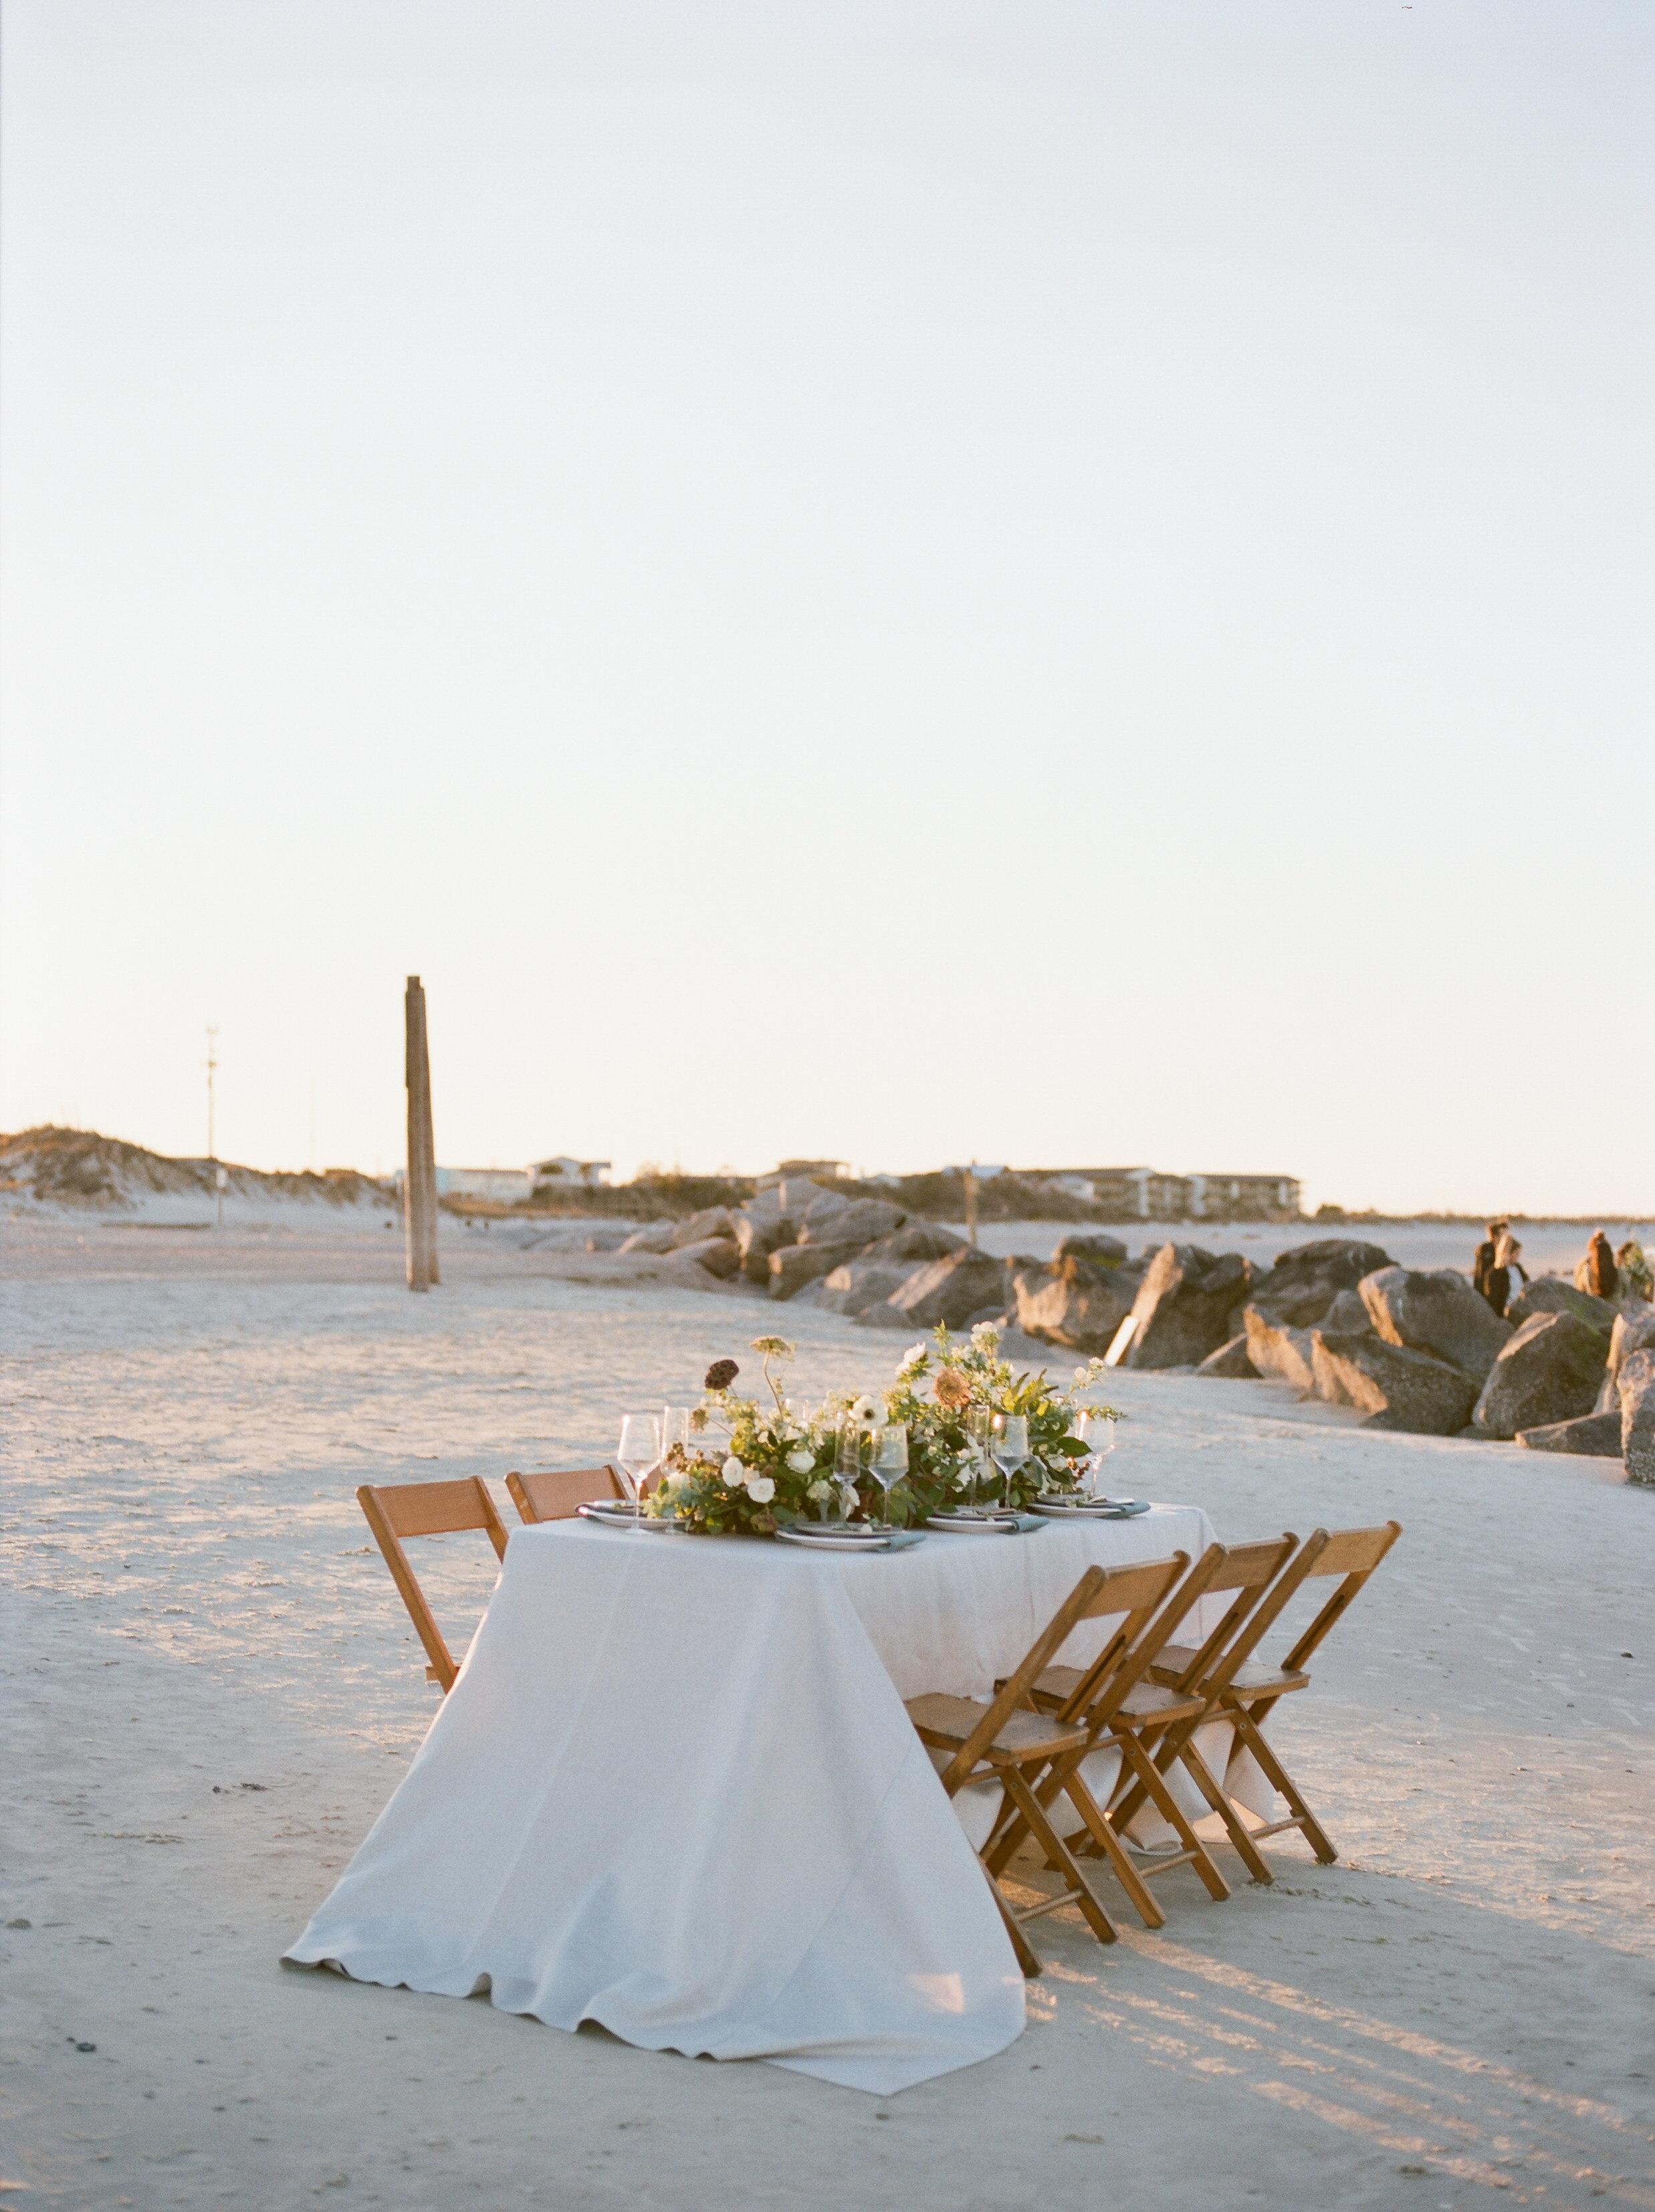 Savannah Wedding Inspiration | Beach Wedding Inspiration | Organic Beach Wedding | Lyndi and Jason Photography | Joy Wed